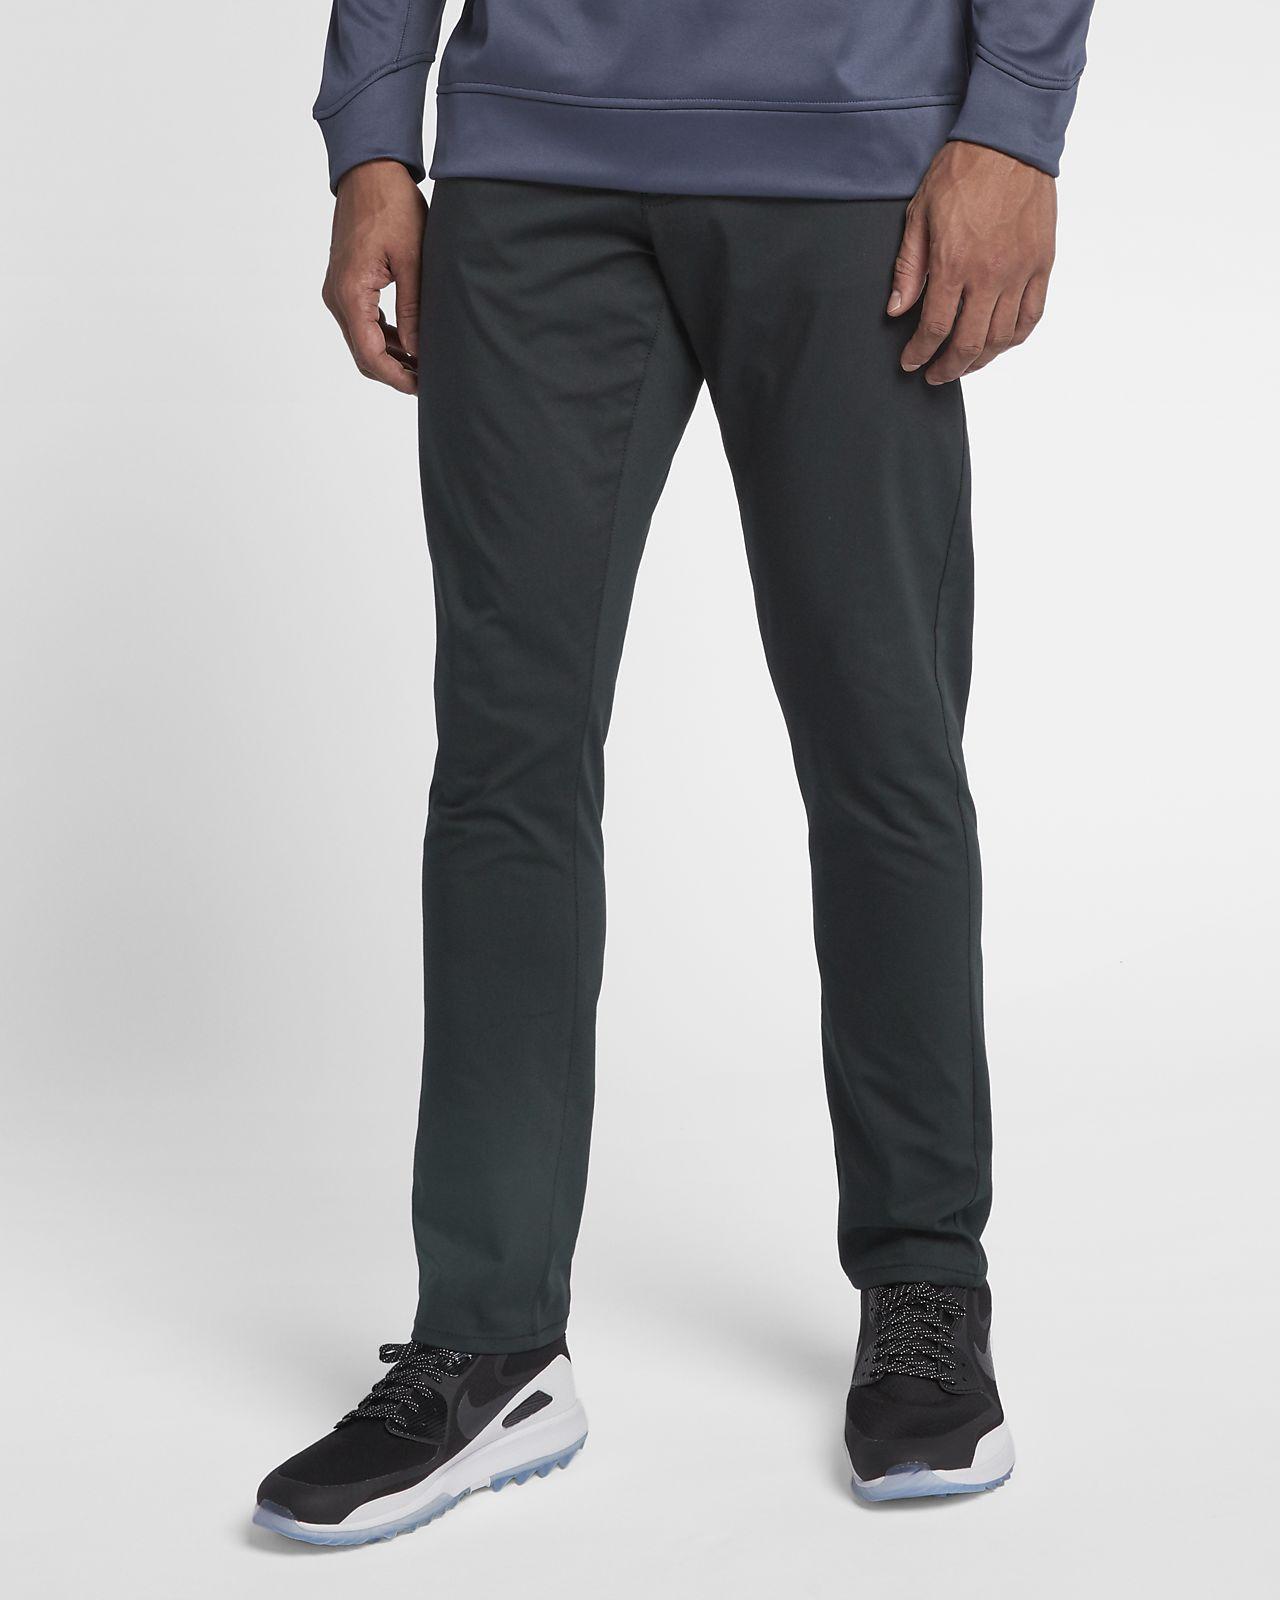 Pantalones de golf de ajuste entallado para hombre Nike Flex 5 Pocket